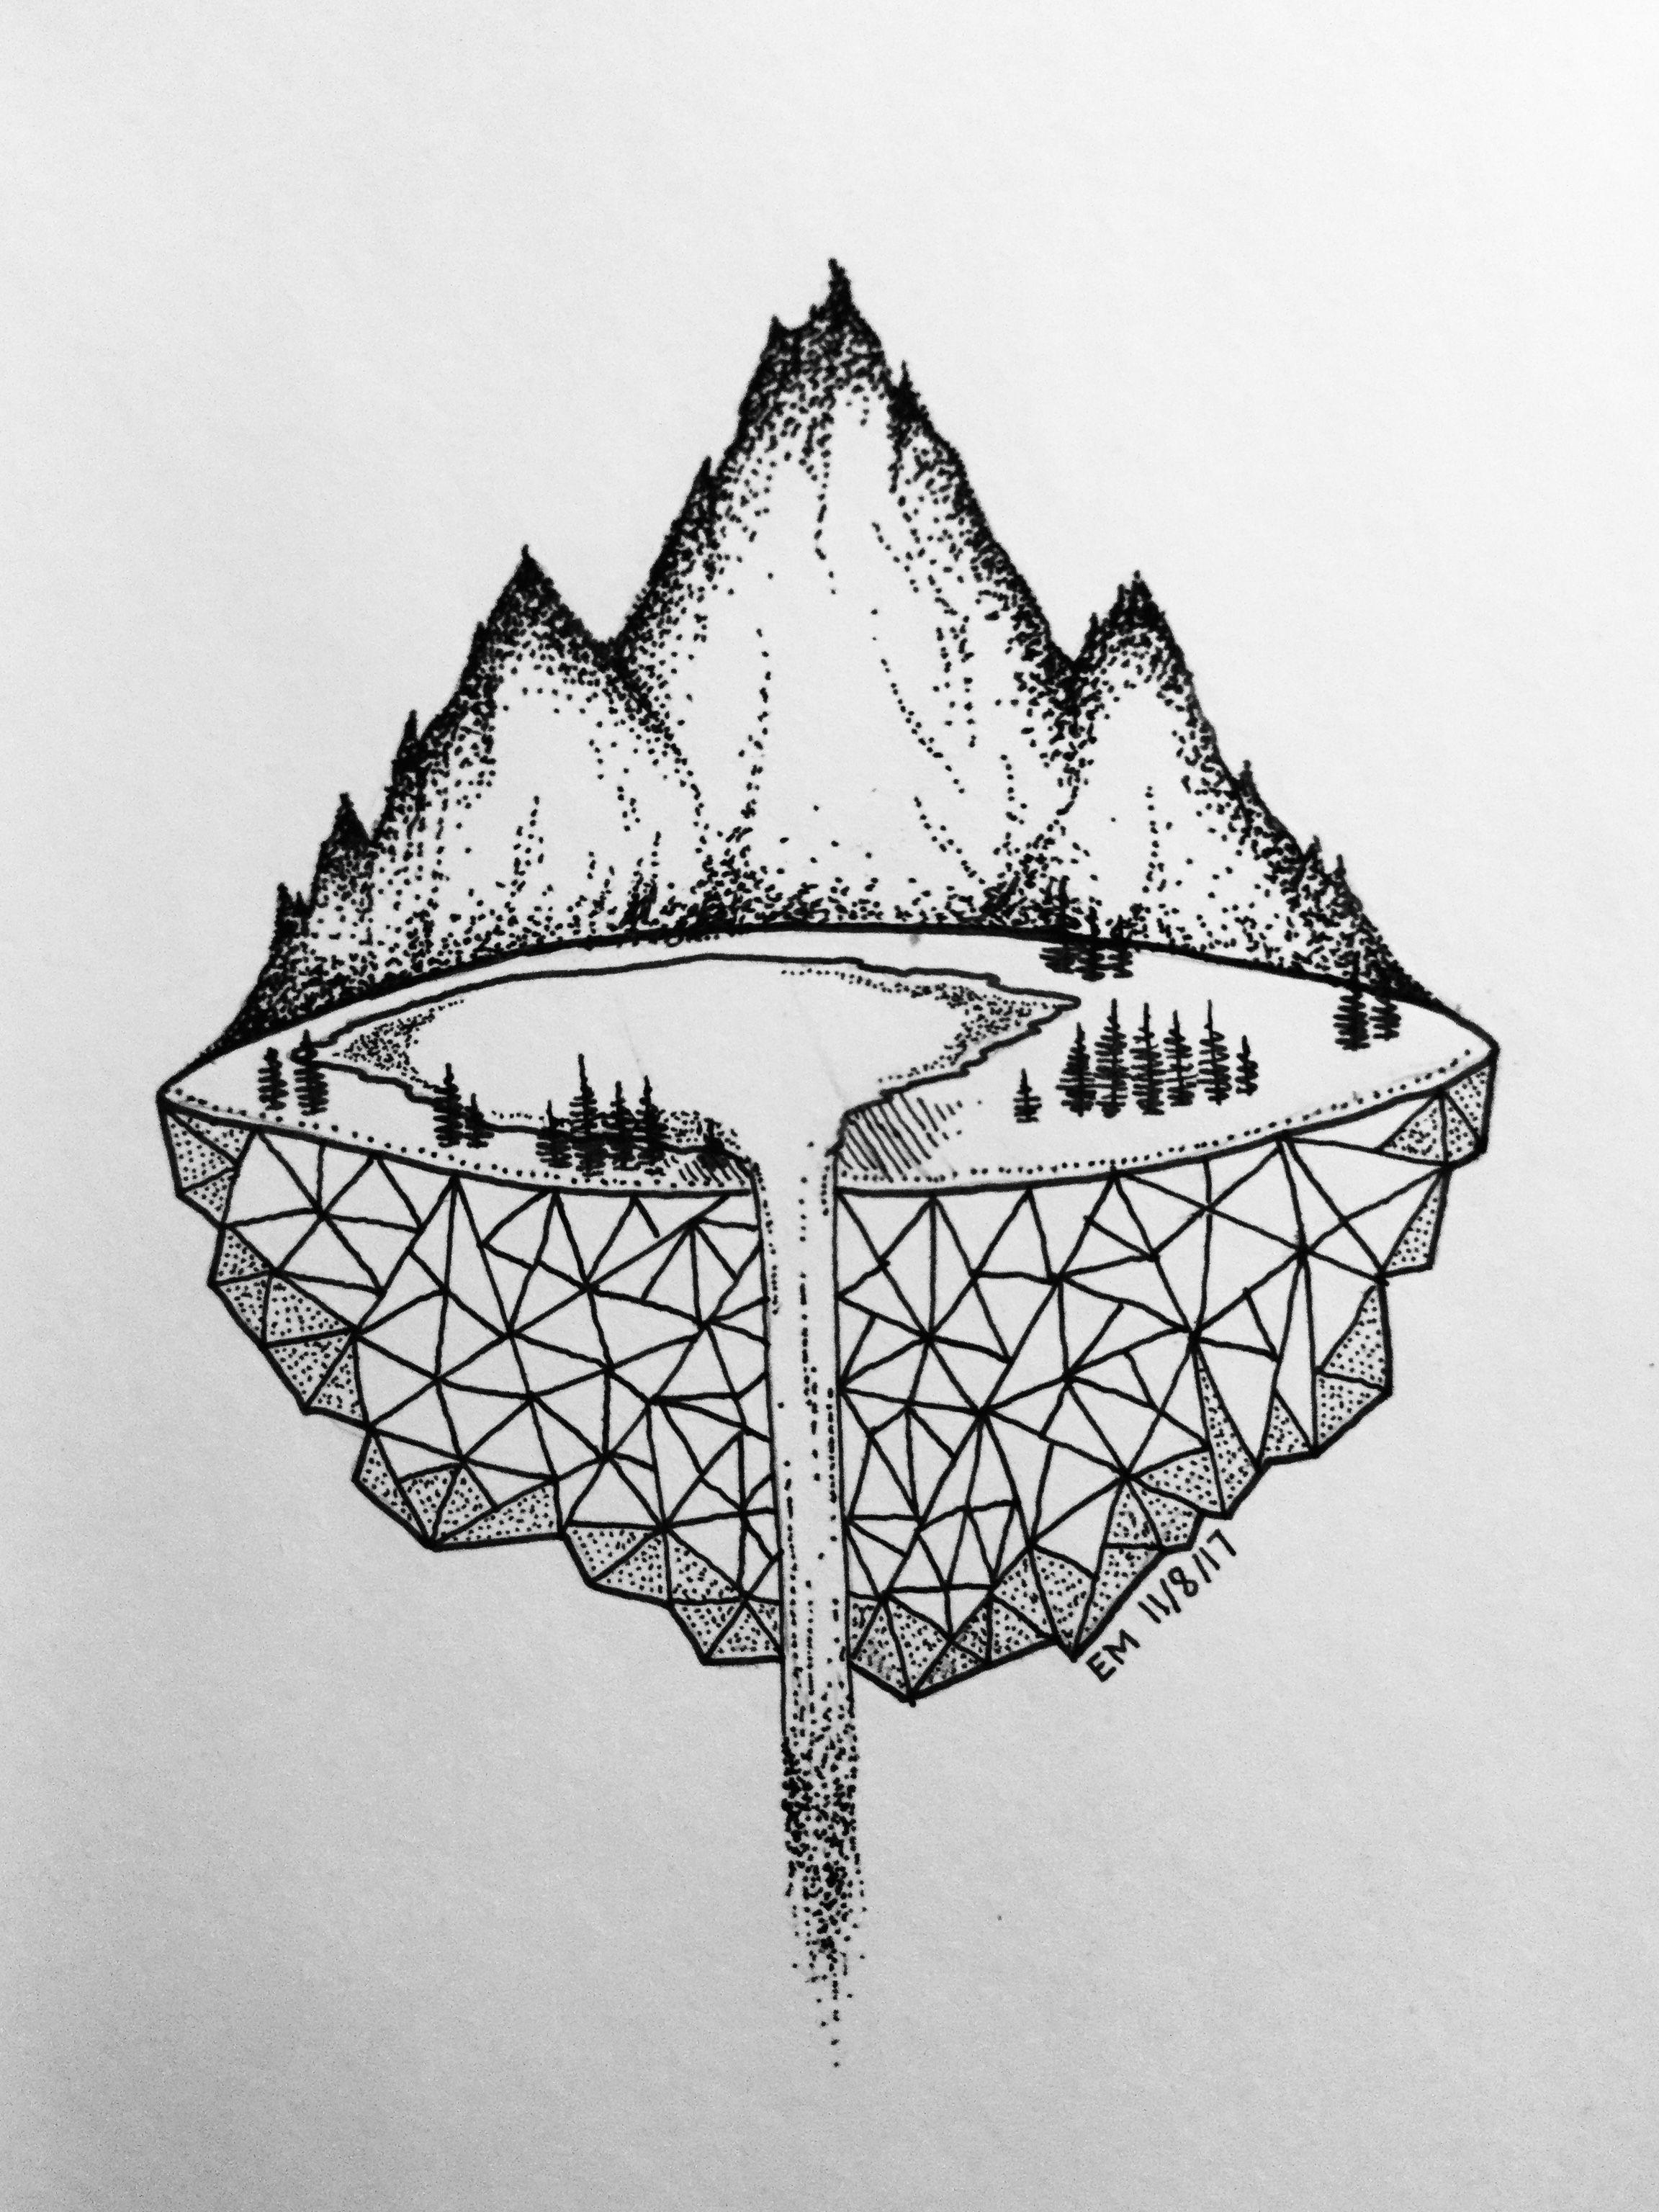 micron mountains tumblr drawings cute drawings dotted drawings pen art art sketchbook